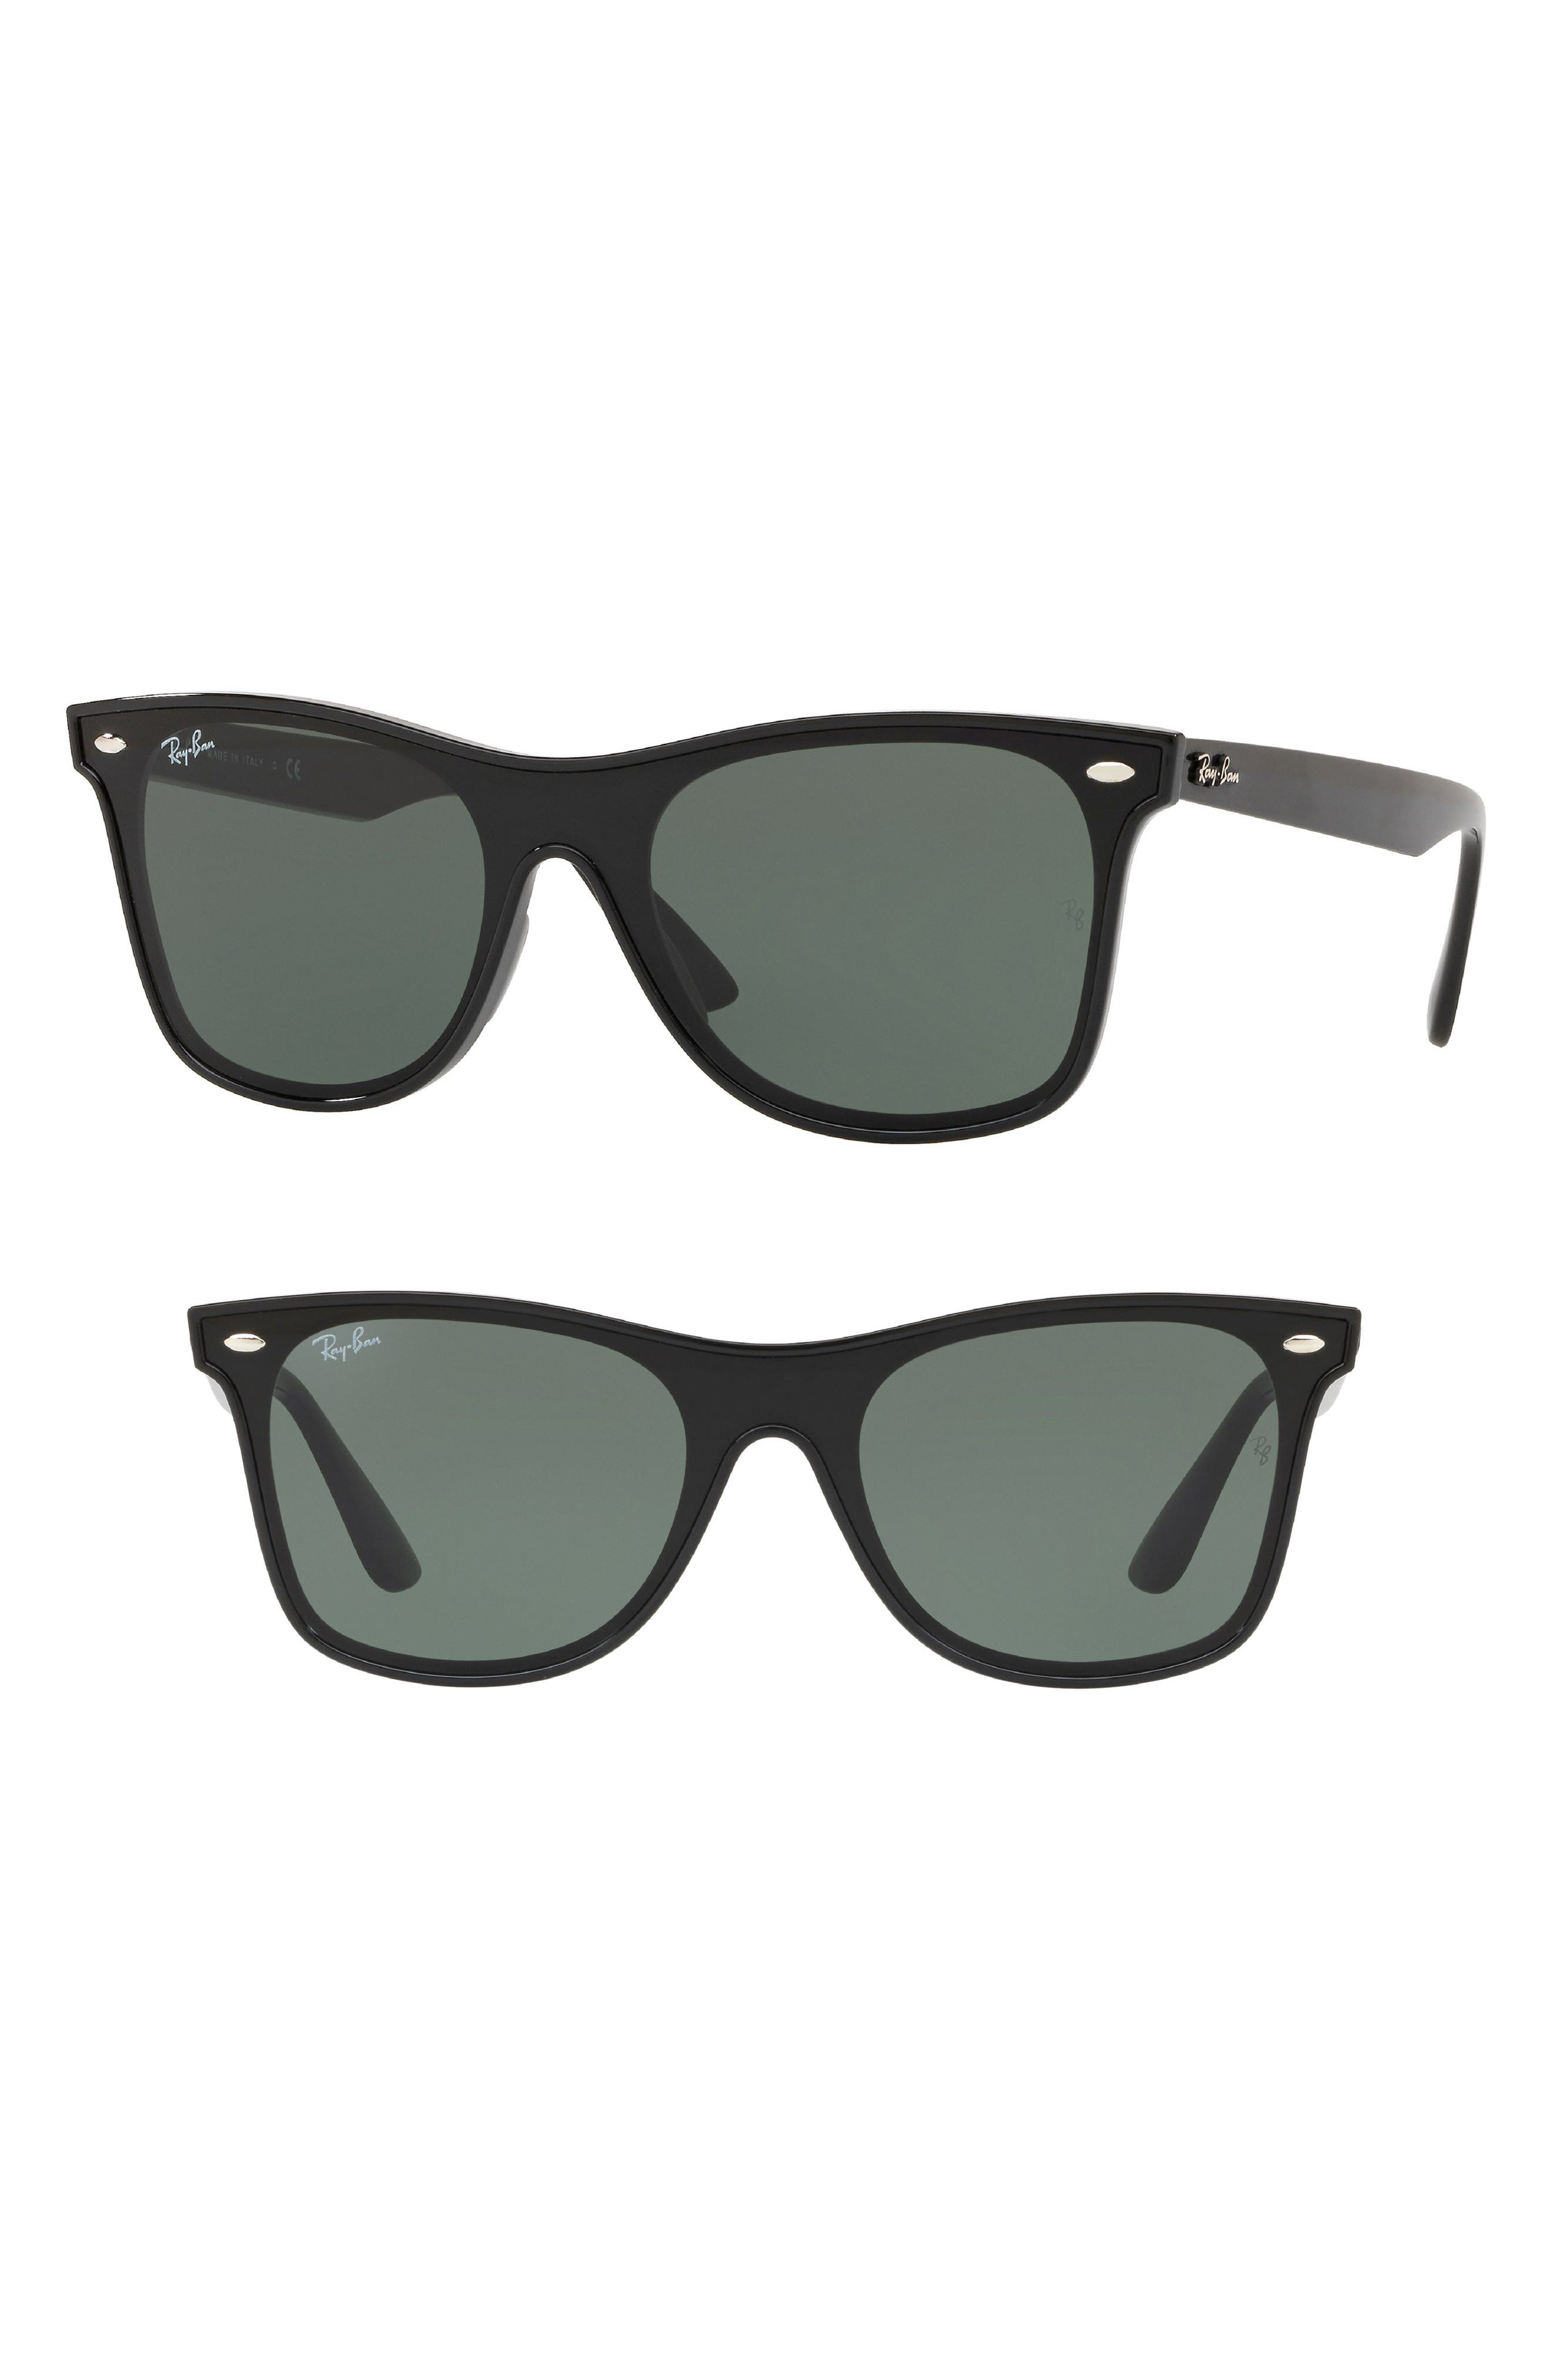 Blaze 41mm Wayfarer Sunglasses,                             Main thumbnail 1, color,                             BLACK SOLID